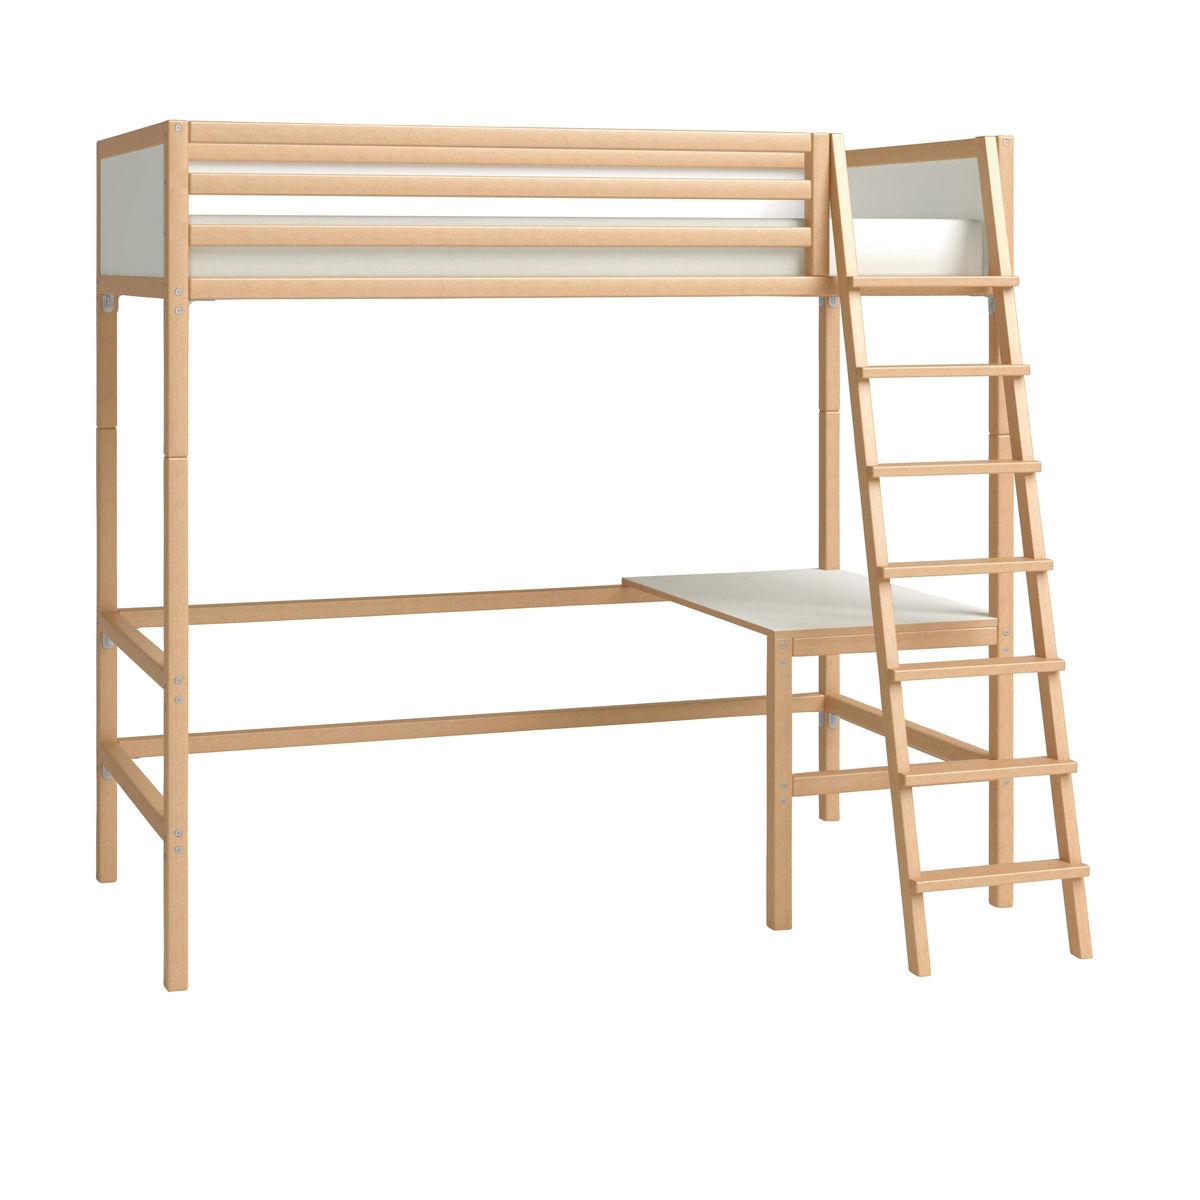 fl totto profilsystem loft bed fl totto. Black Bedroom Furniture Sets. Home Design Ideas